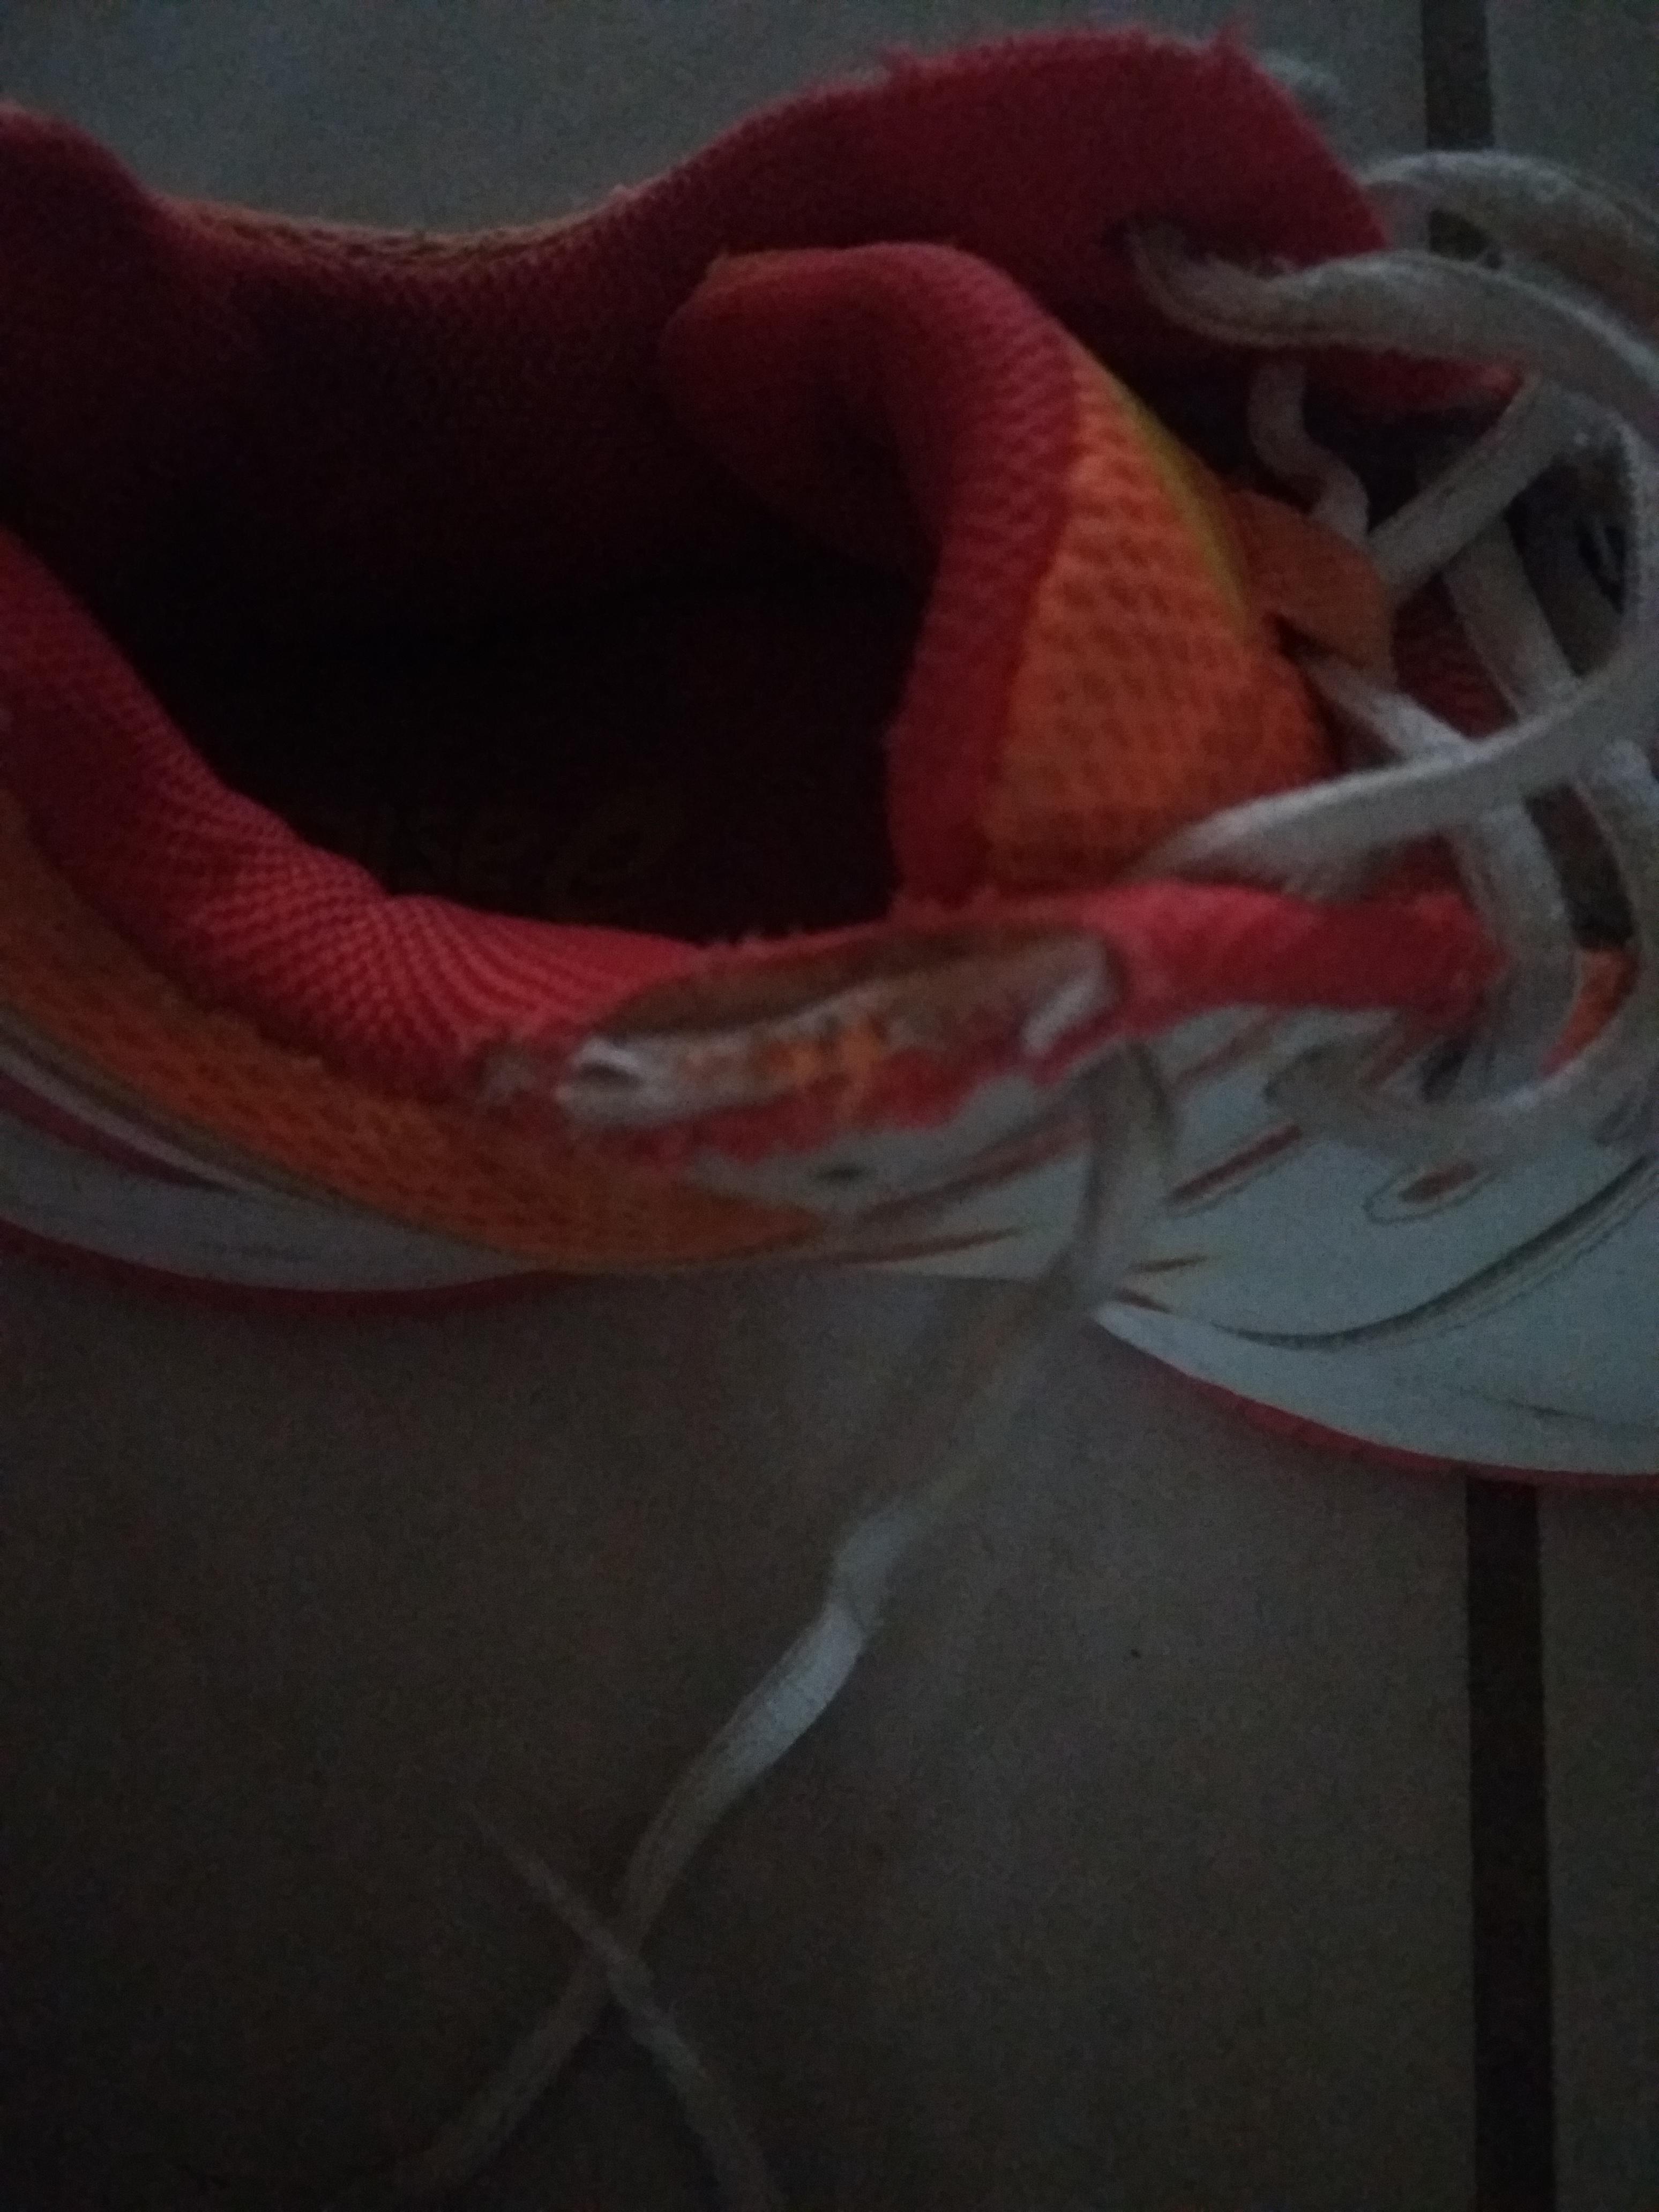 troc de troc basket oasics image 2